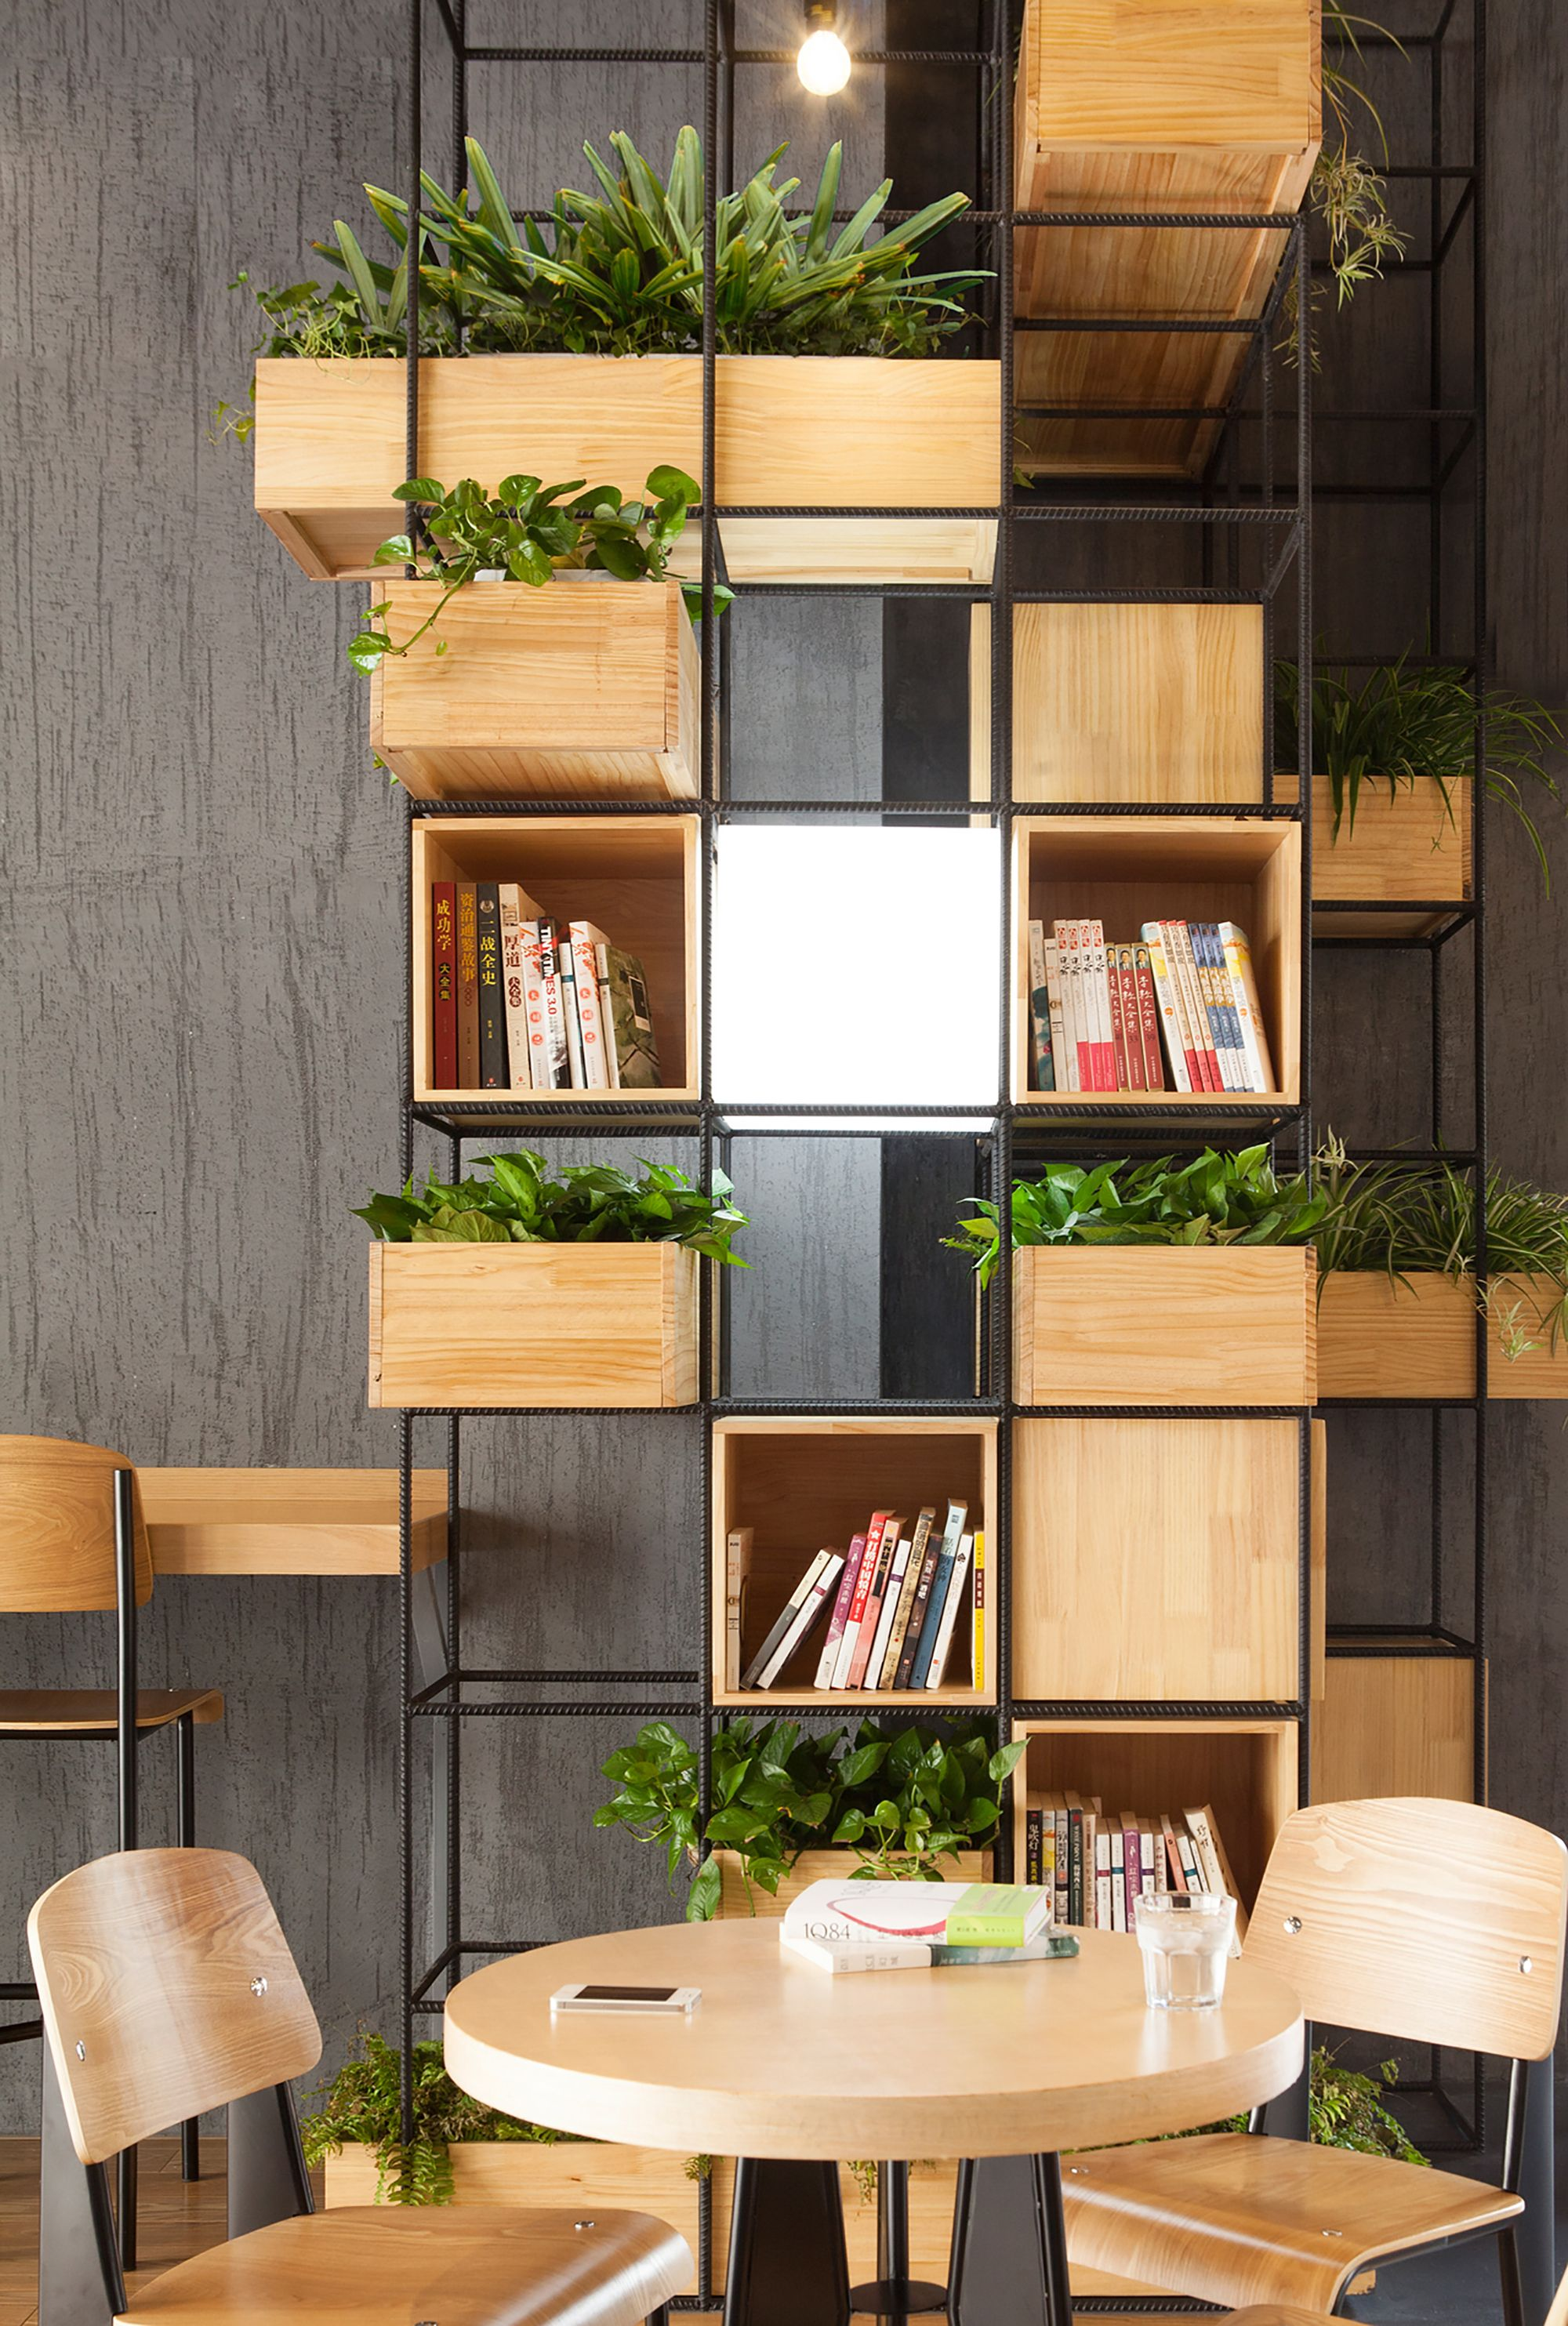 Galería de home cafes penda cafes interiors and shelves